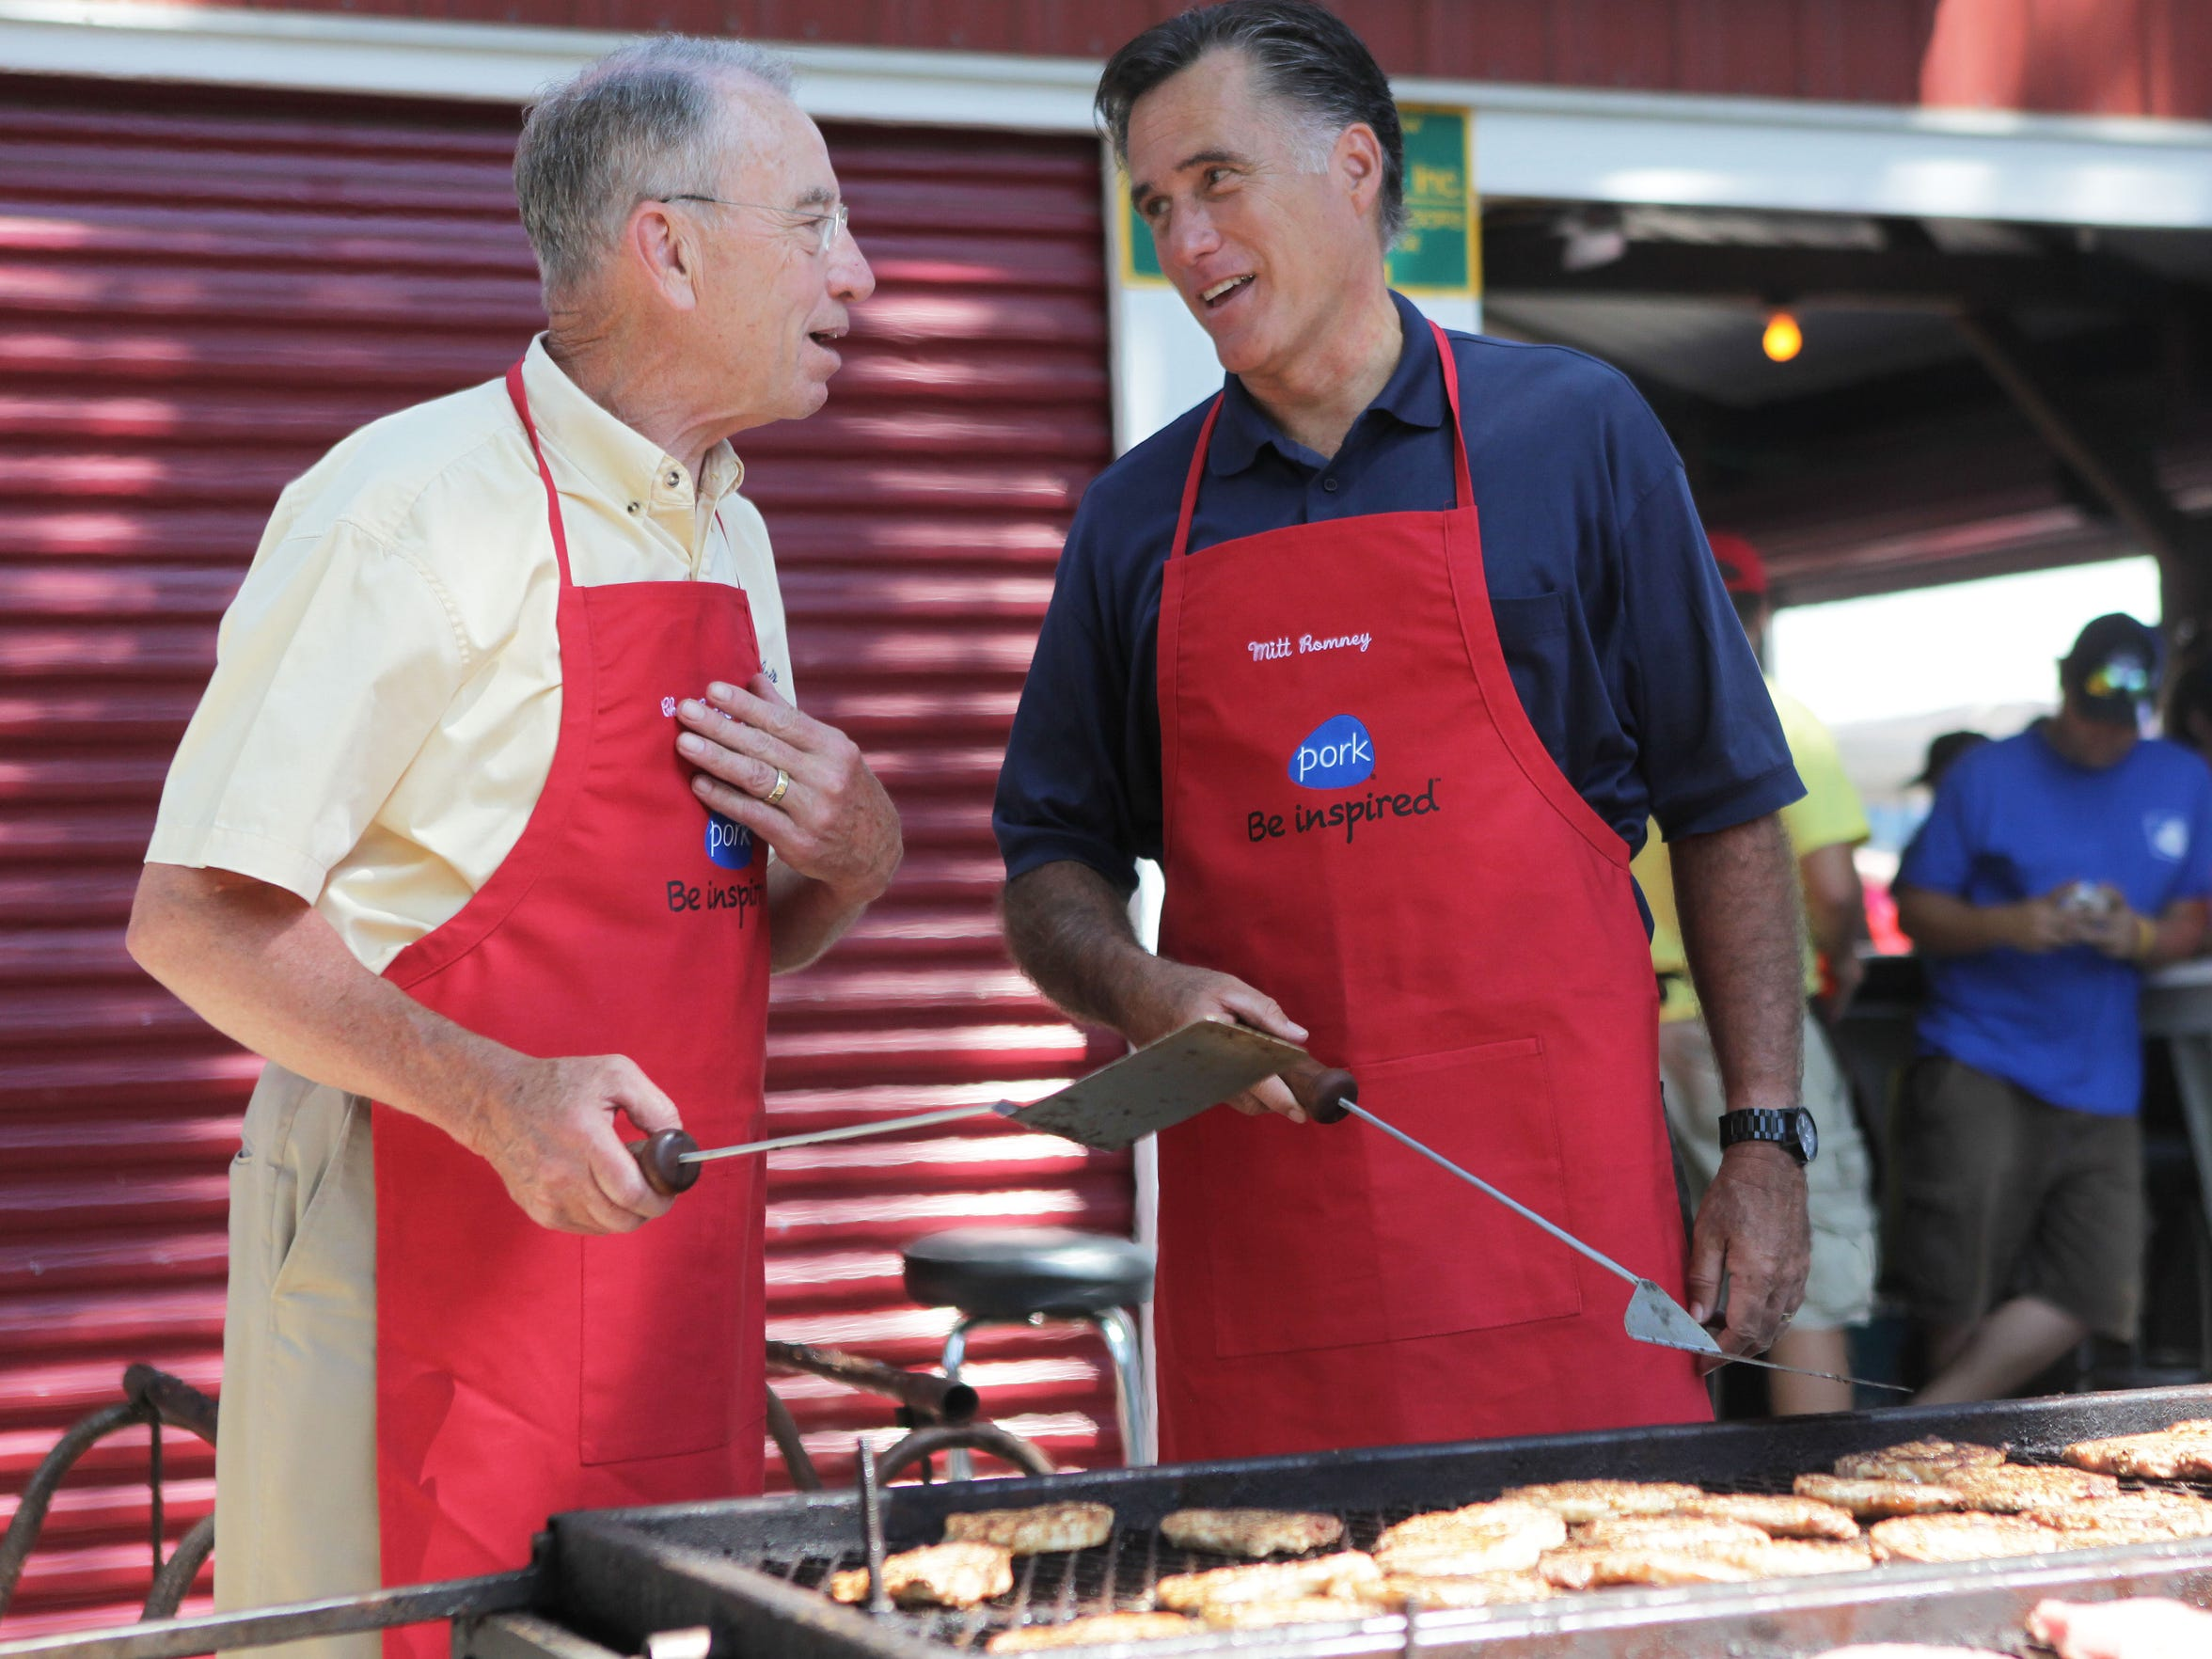 Republican presidential candidate Mitt Romney flips pork chops with Sen. Chuck Grassley at the Iowa Pork Tent at the 2011 Iowa State Fair.